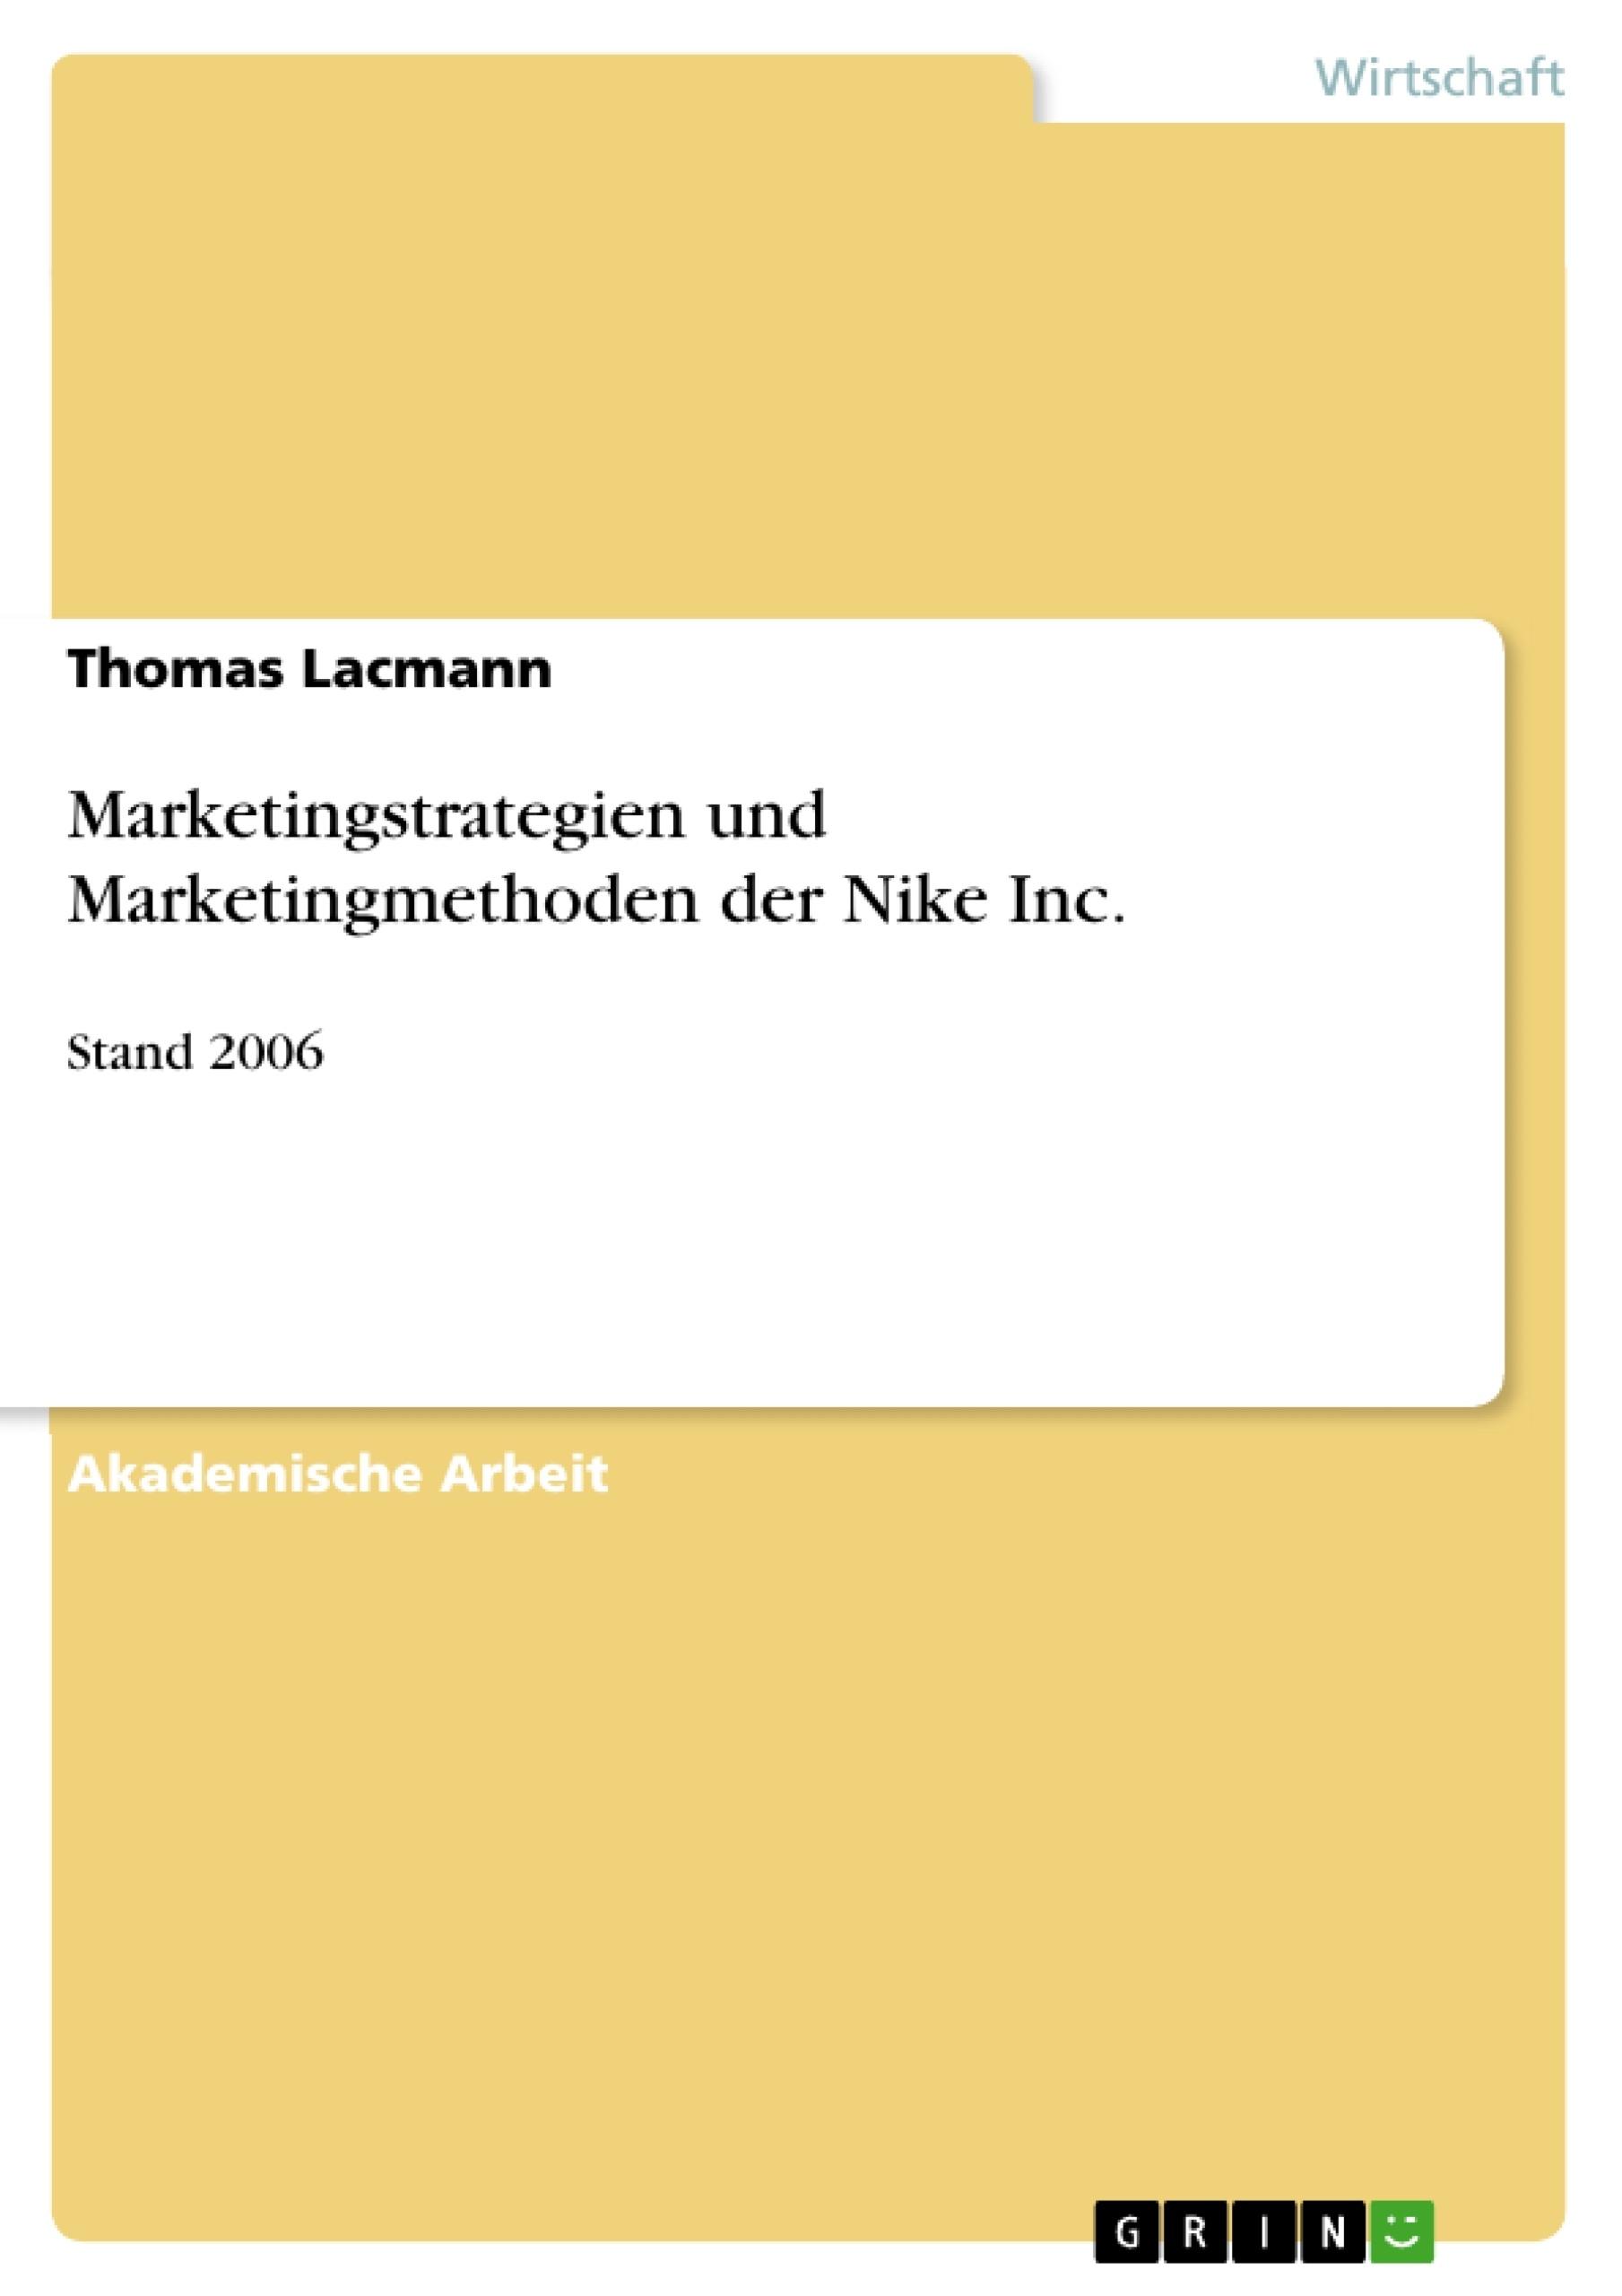 Titel: Marketingstrategien und Marketingmethoden der Nike Inc.